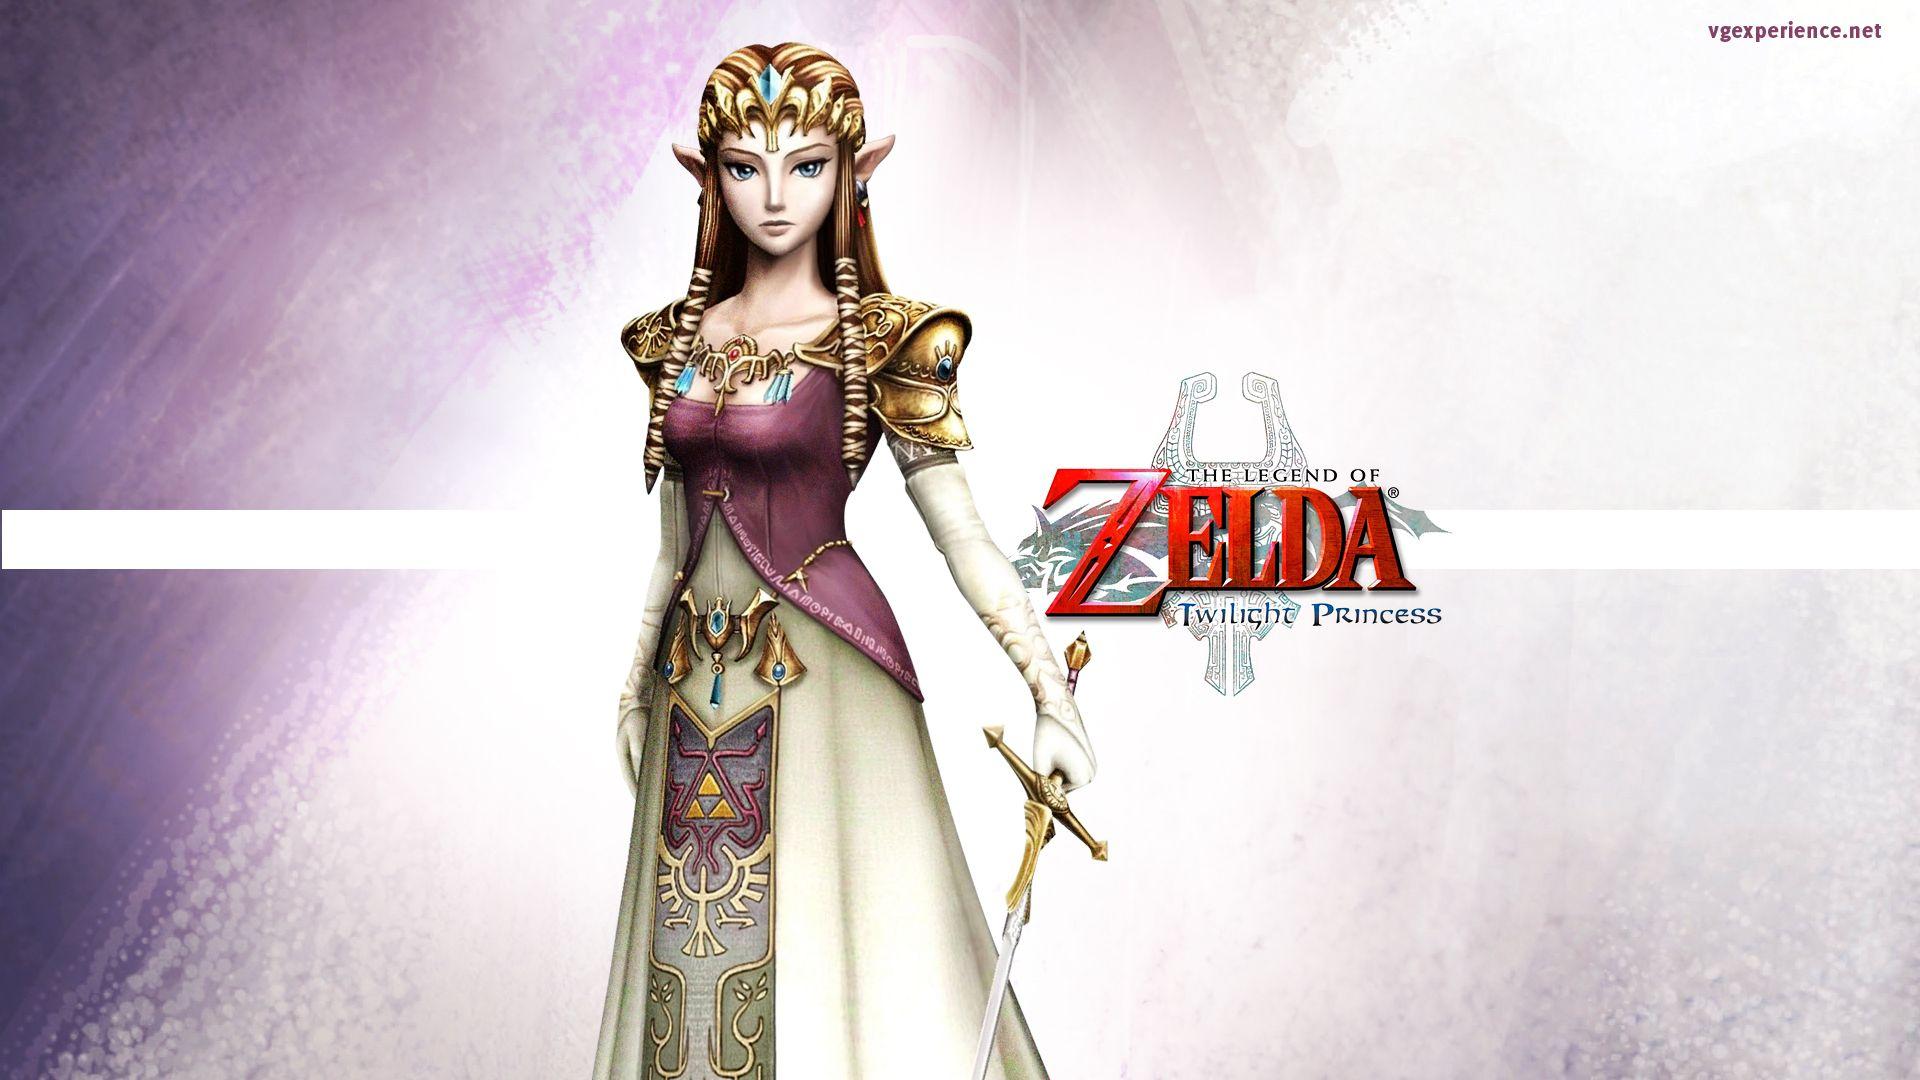 ee8492752c692d36901786a75567252d_legend-of-zelda-twilight-zelda-twilight-princess-clipart-1920x1080_1920-1080.jpeg (1920×1080)